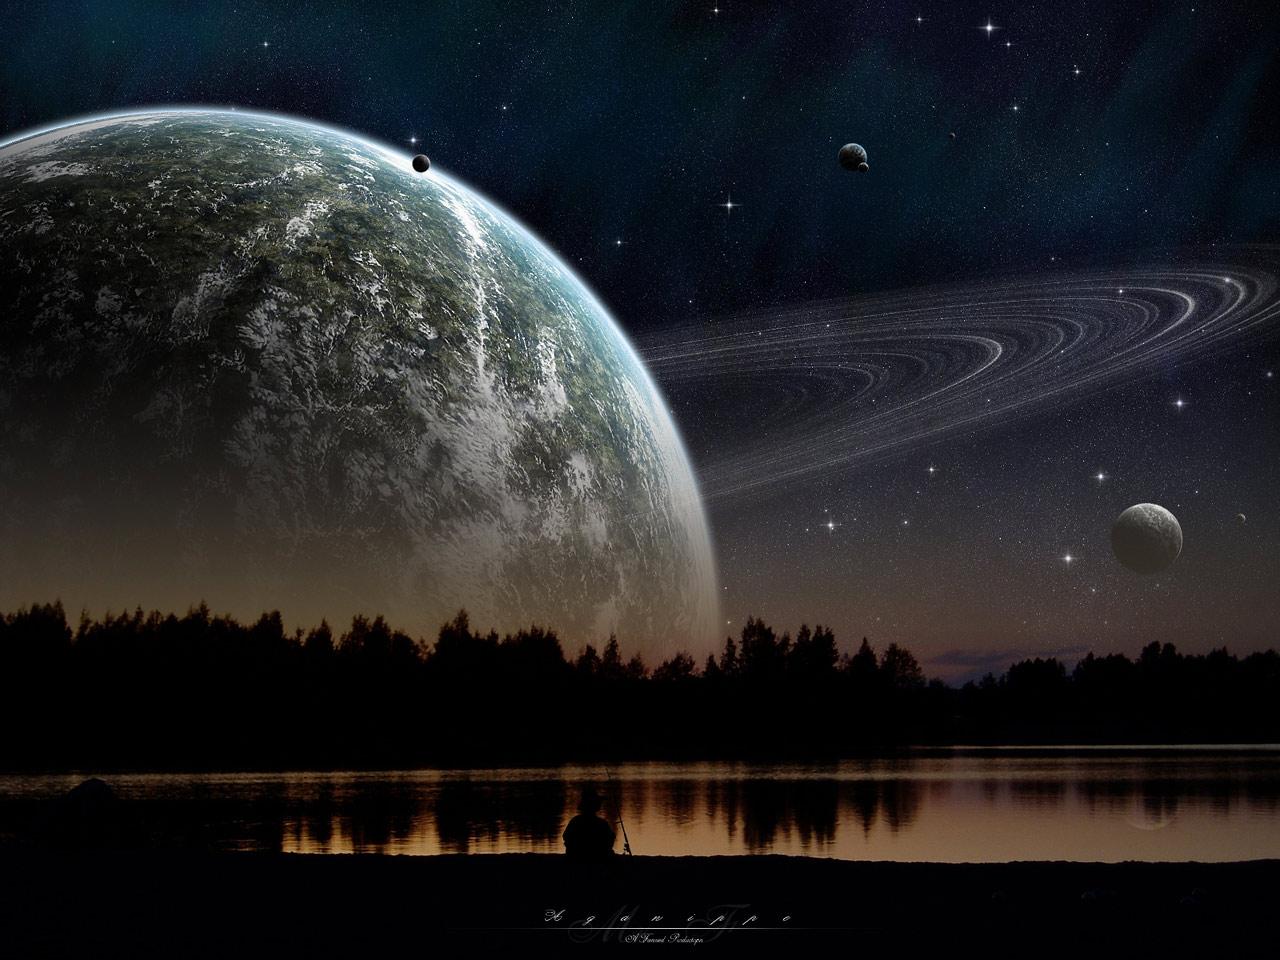 Hd wallpaper night - Natural Night Wallpaper